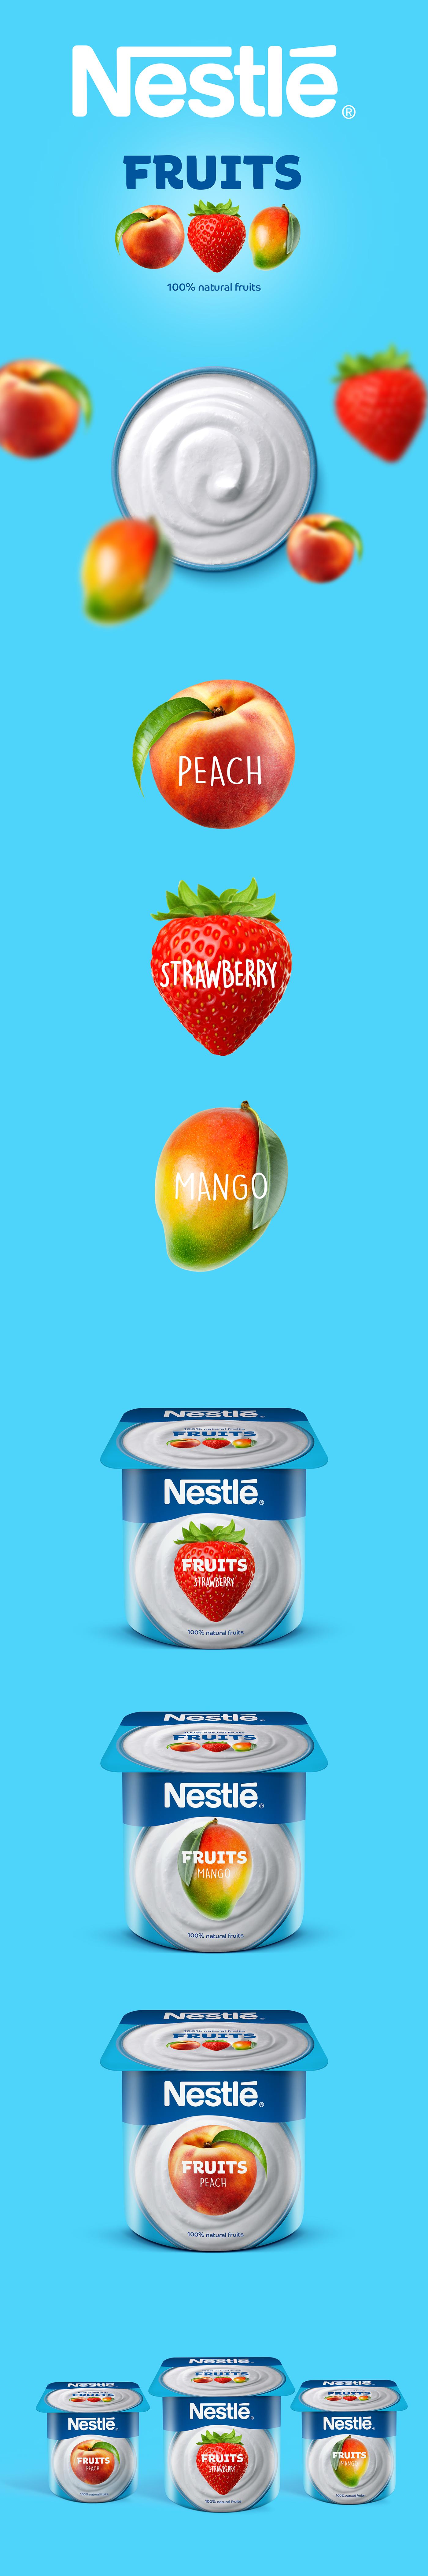 nestle fruits strawberry peach Mango yogurt mix packaging design packs cups leoburnett